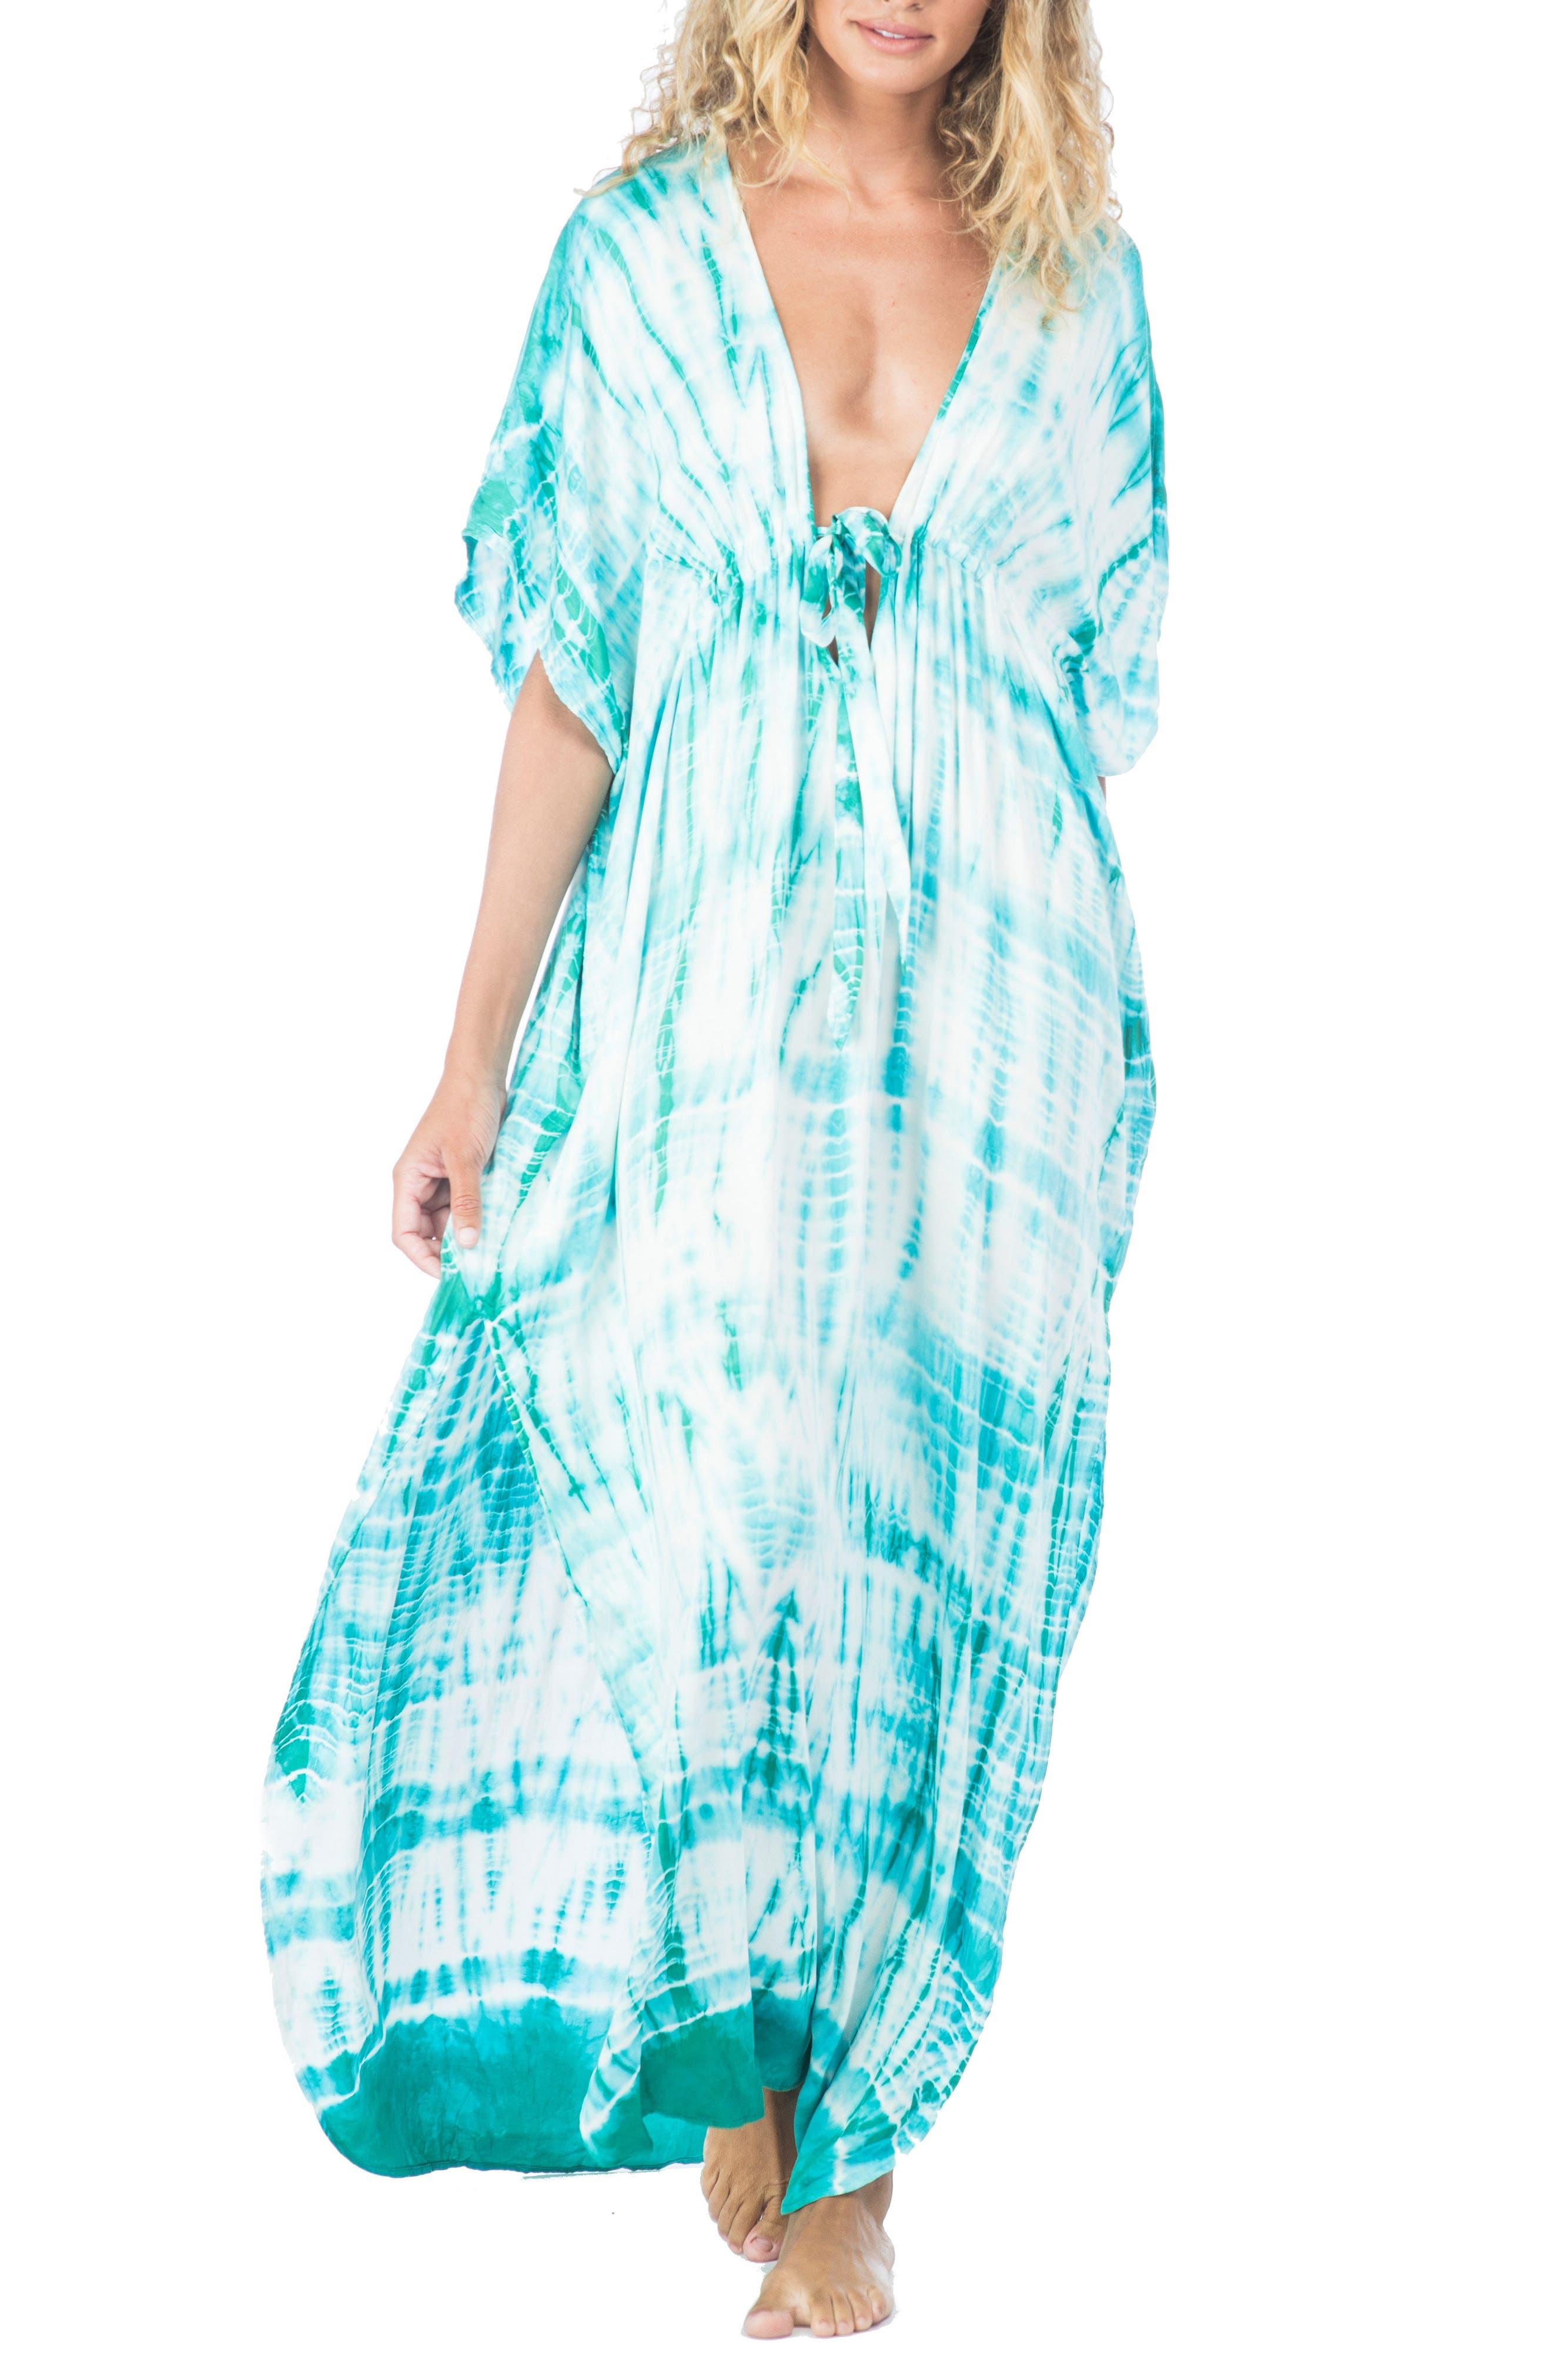 South Beach Tie Dye Ashley Cover-Up Dress,                             Main thumbnail 1, color,